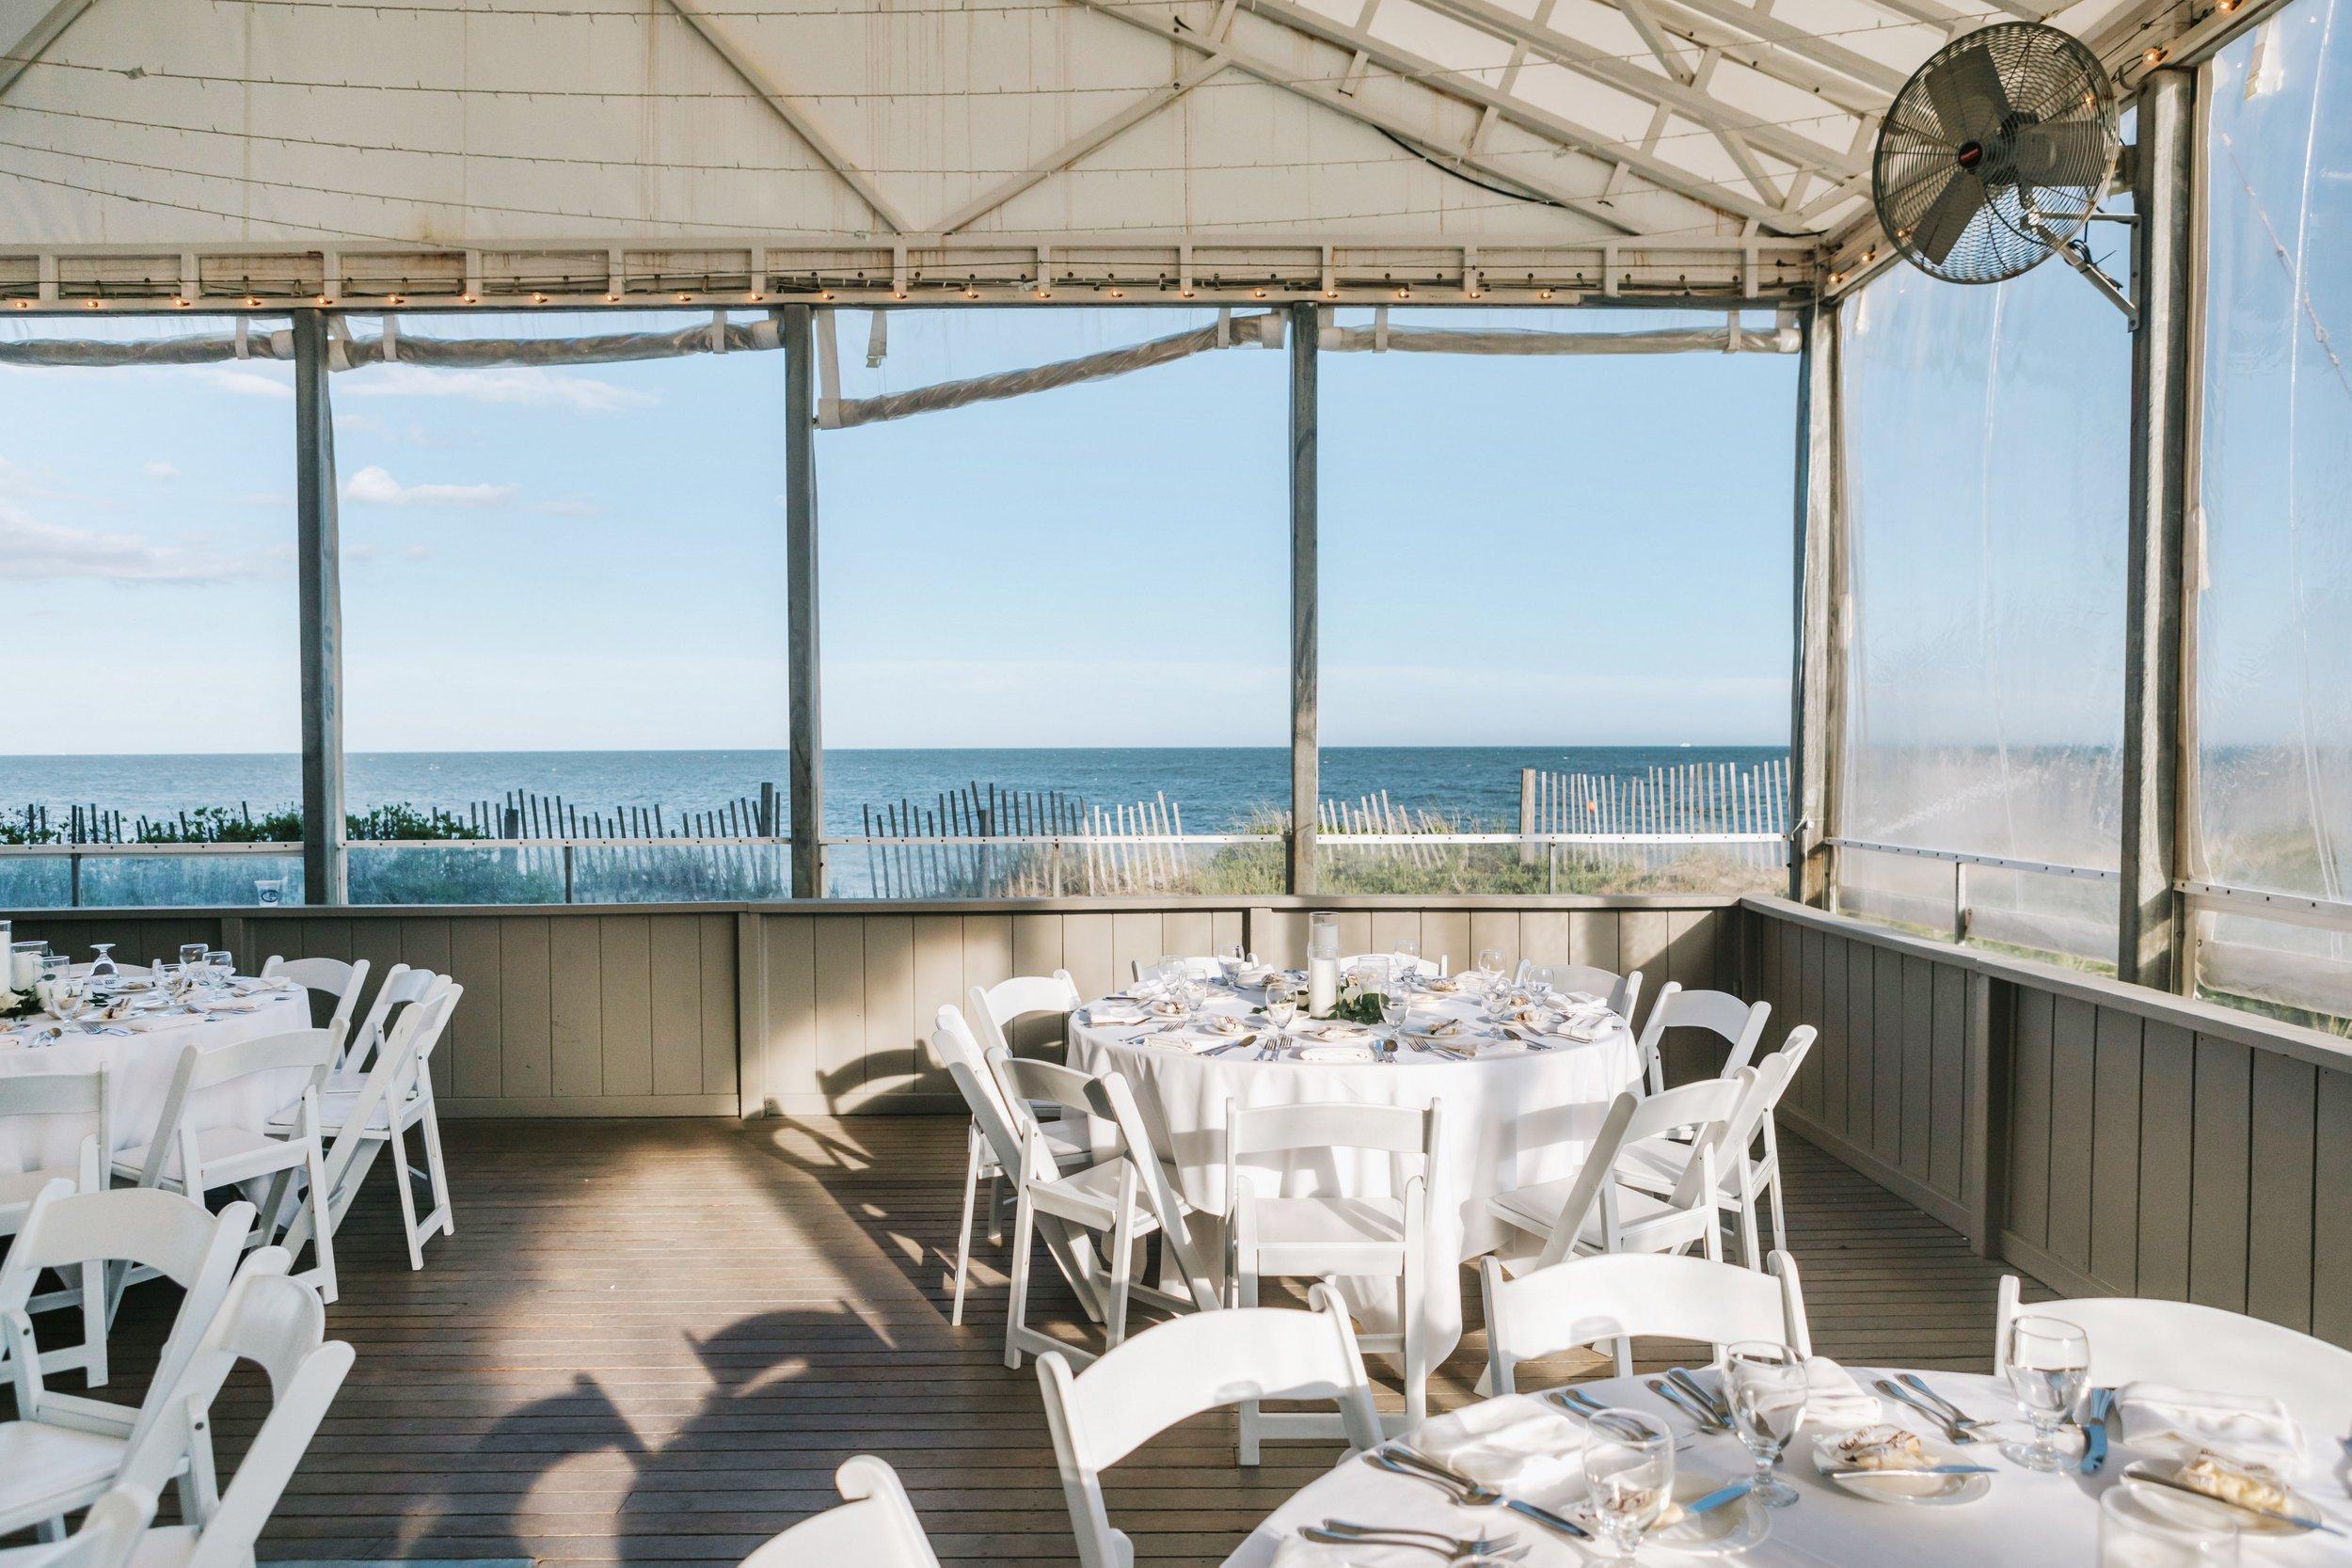 Popponesset-Inn-Wedding-Cape-Cod-Lena-Mirisola-Photography-39.jpg